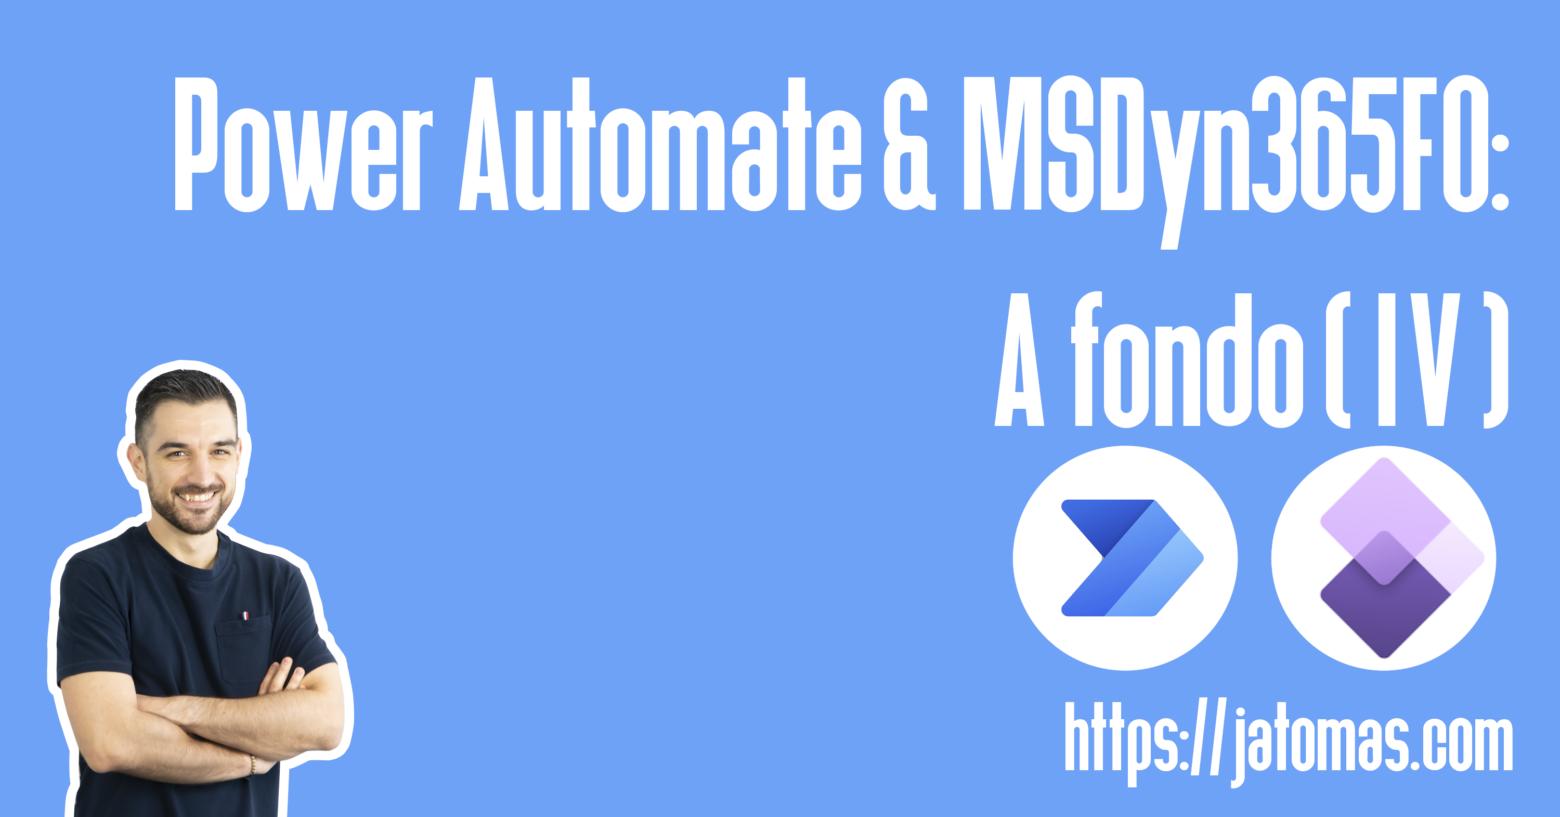 jatomas.com - Power automate & MSDyn365FO: A fondo (IV)